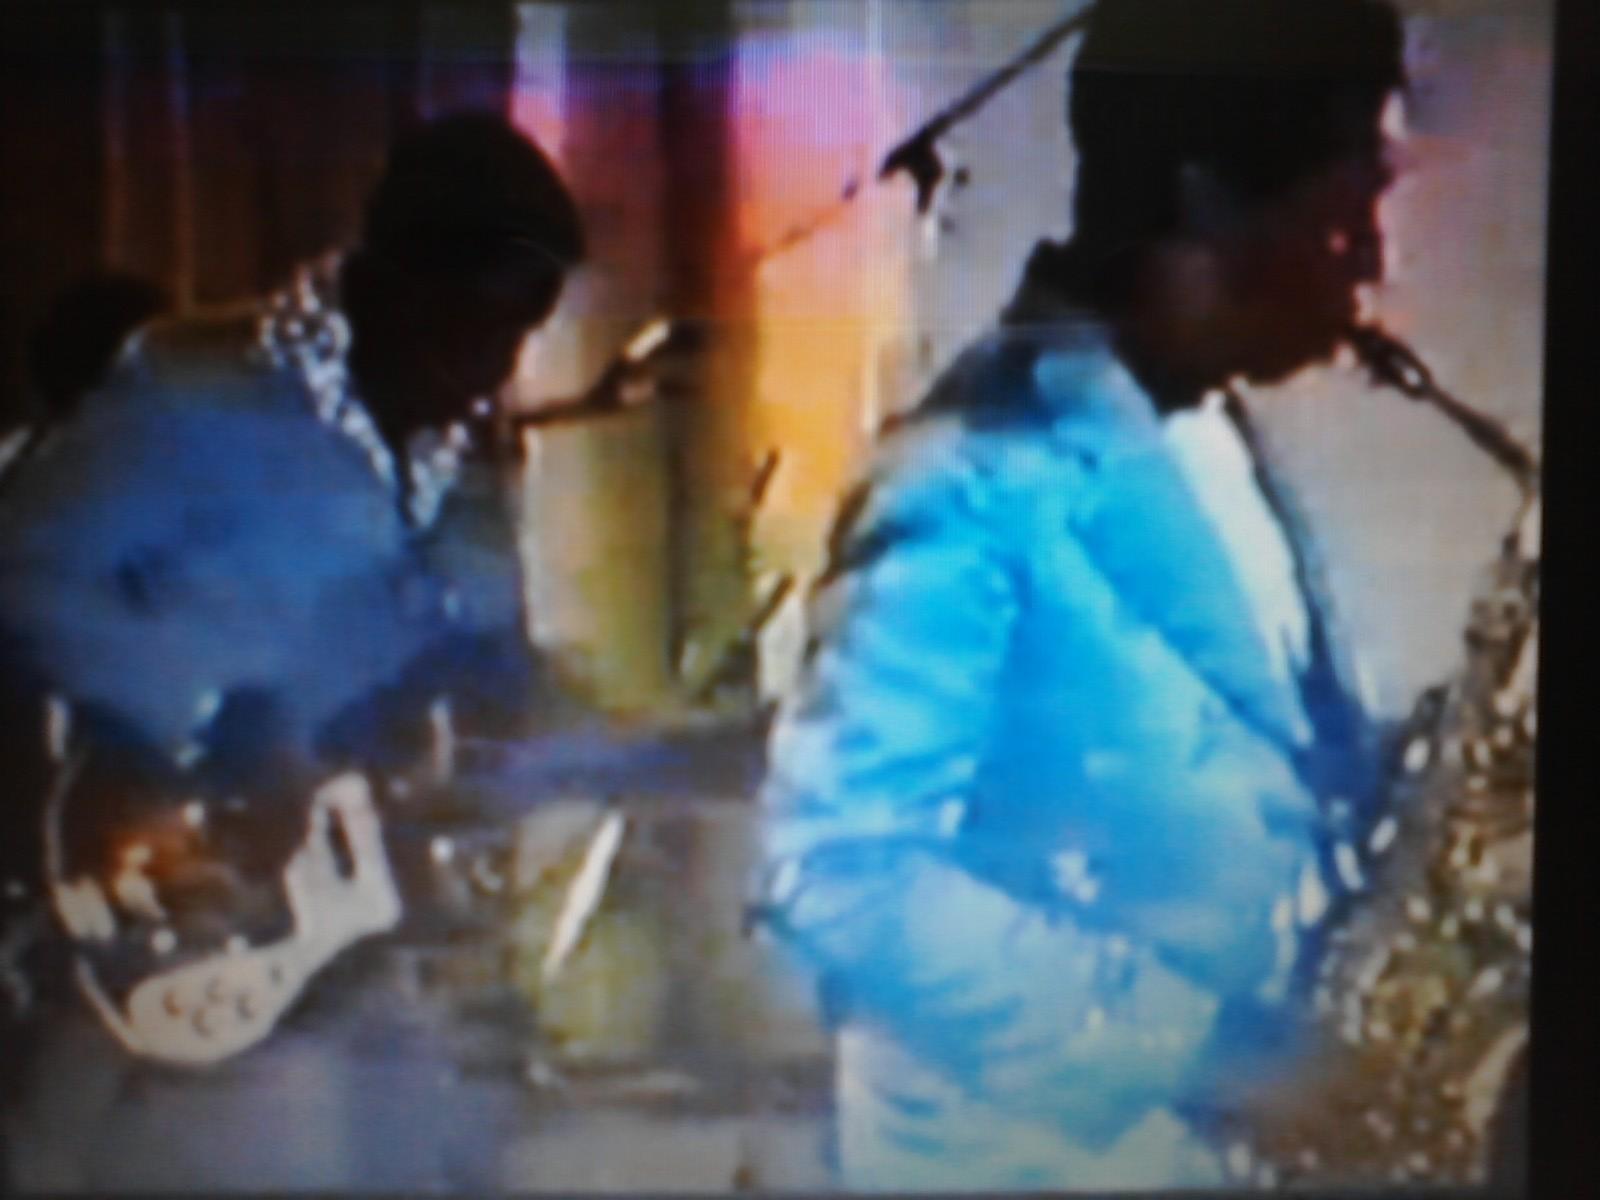 Fred Williams & Ornette Coleman